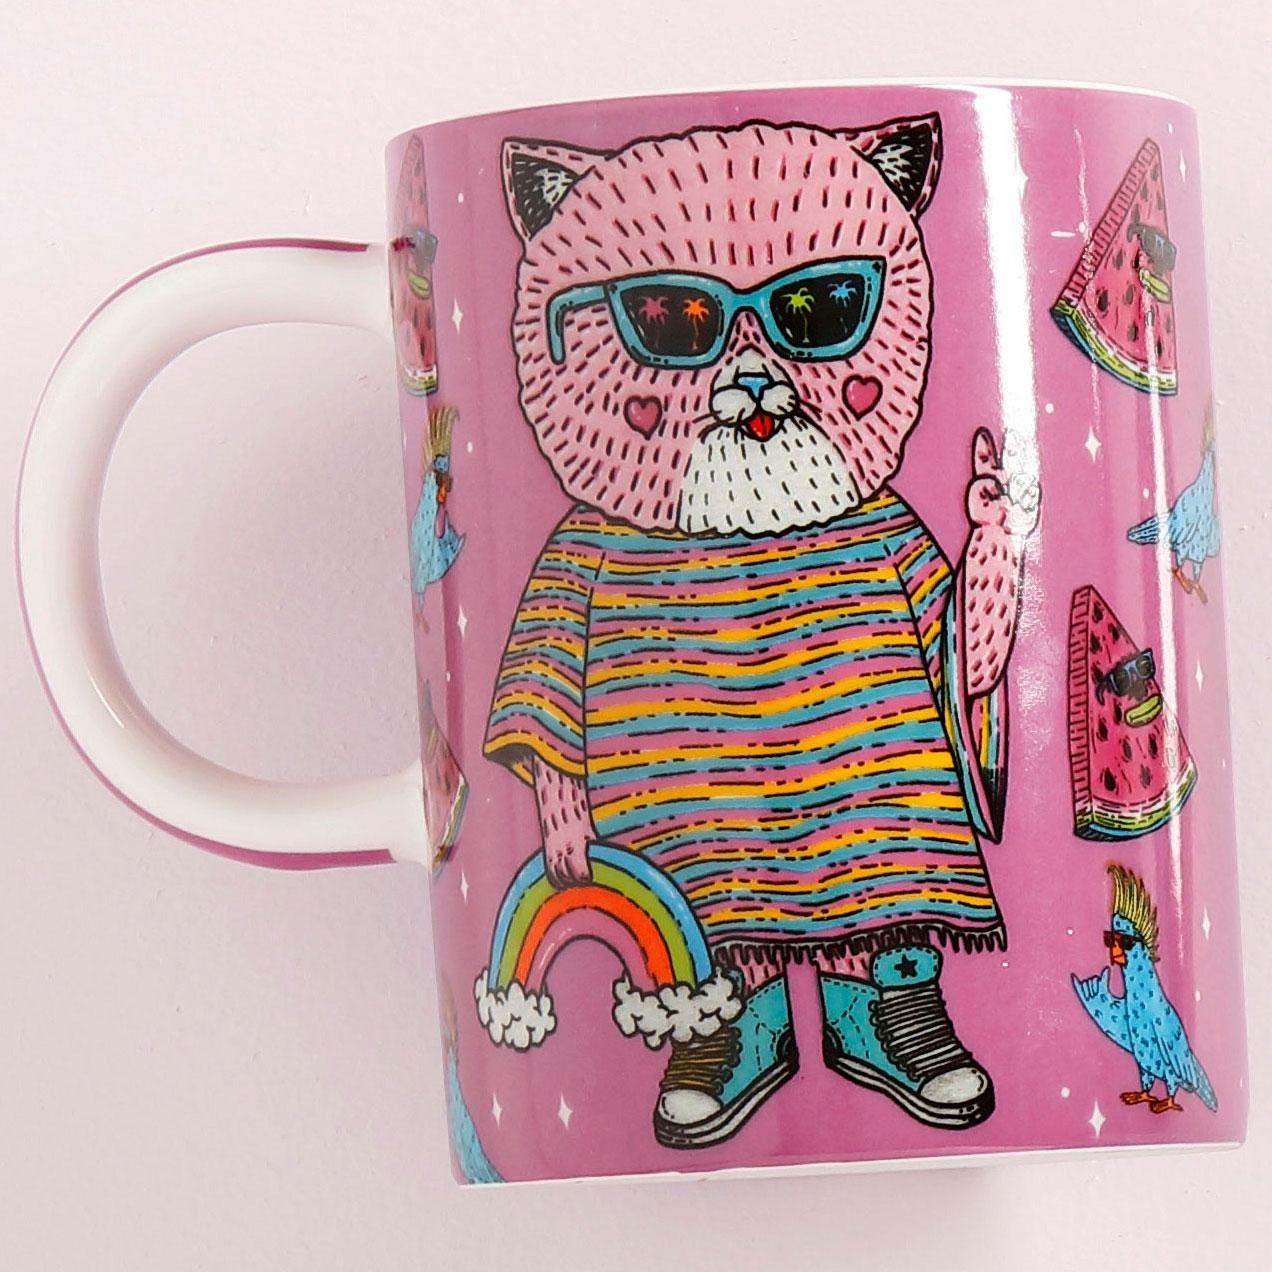 Maxwell Williams Mulga The Artist Cat Mug 450ml Living Giving